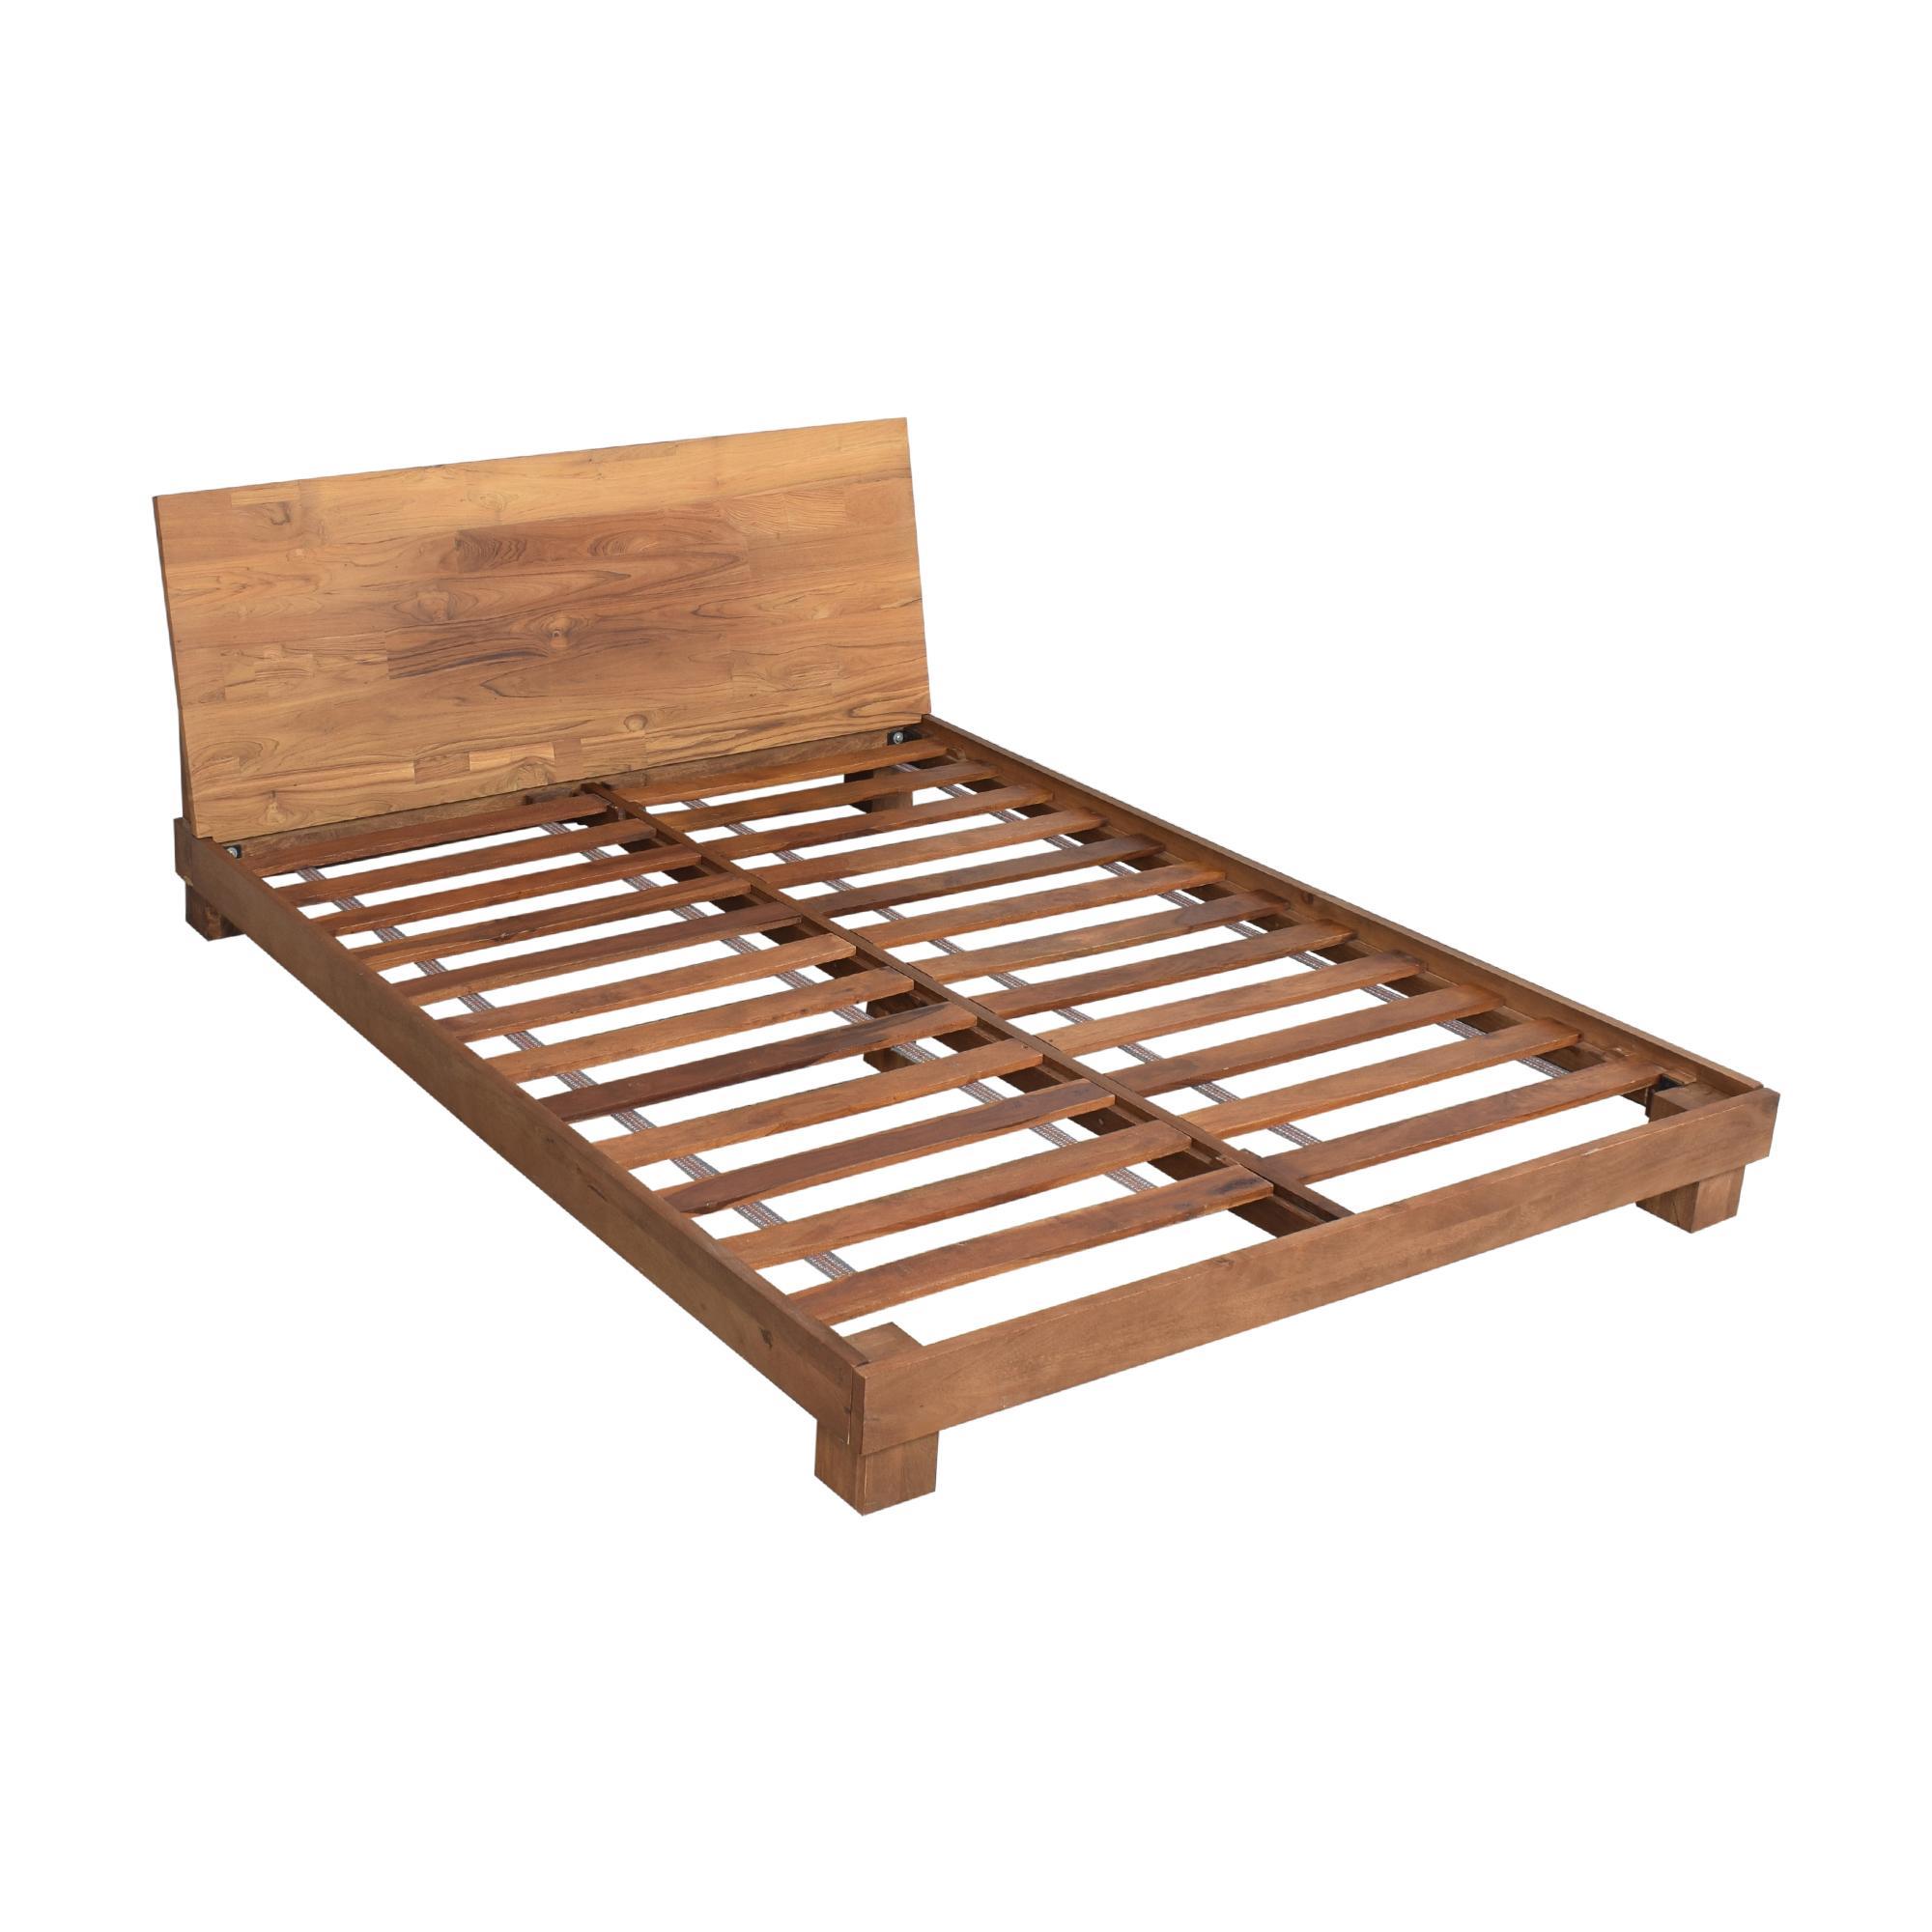 CB2 CB2 Dondra Queen Bed Bed Frames